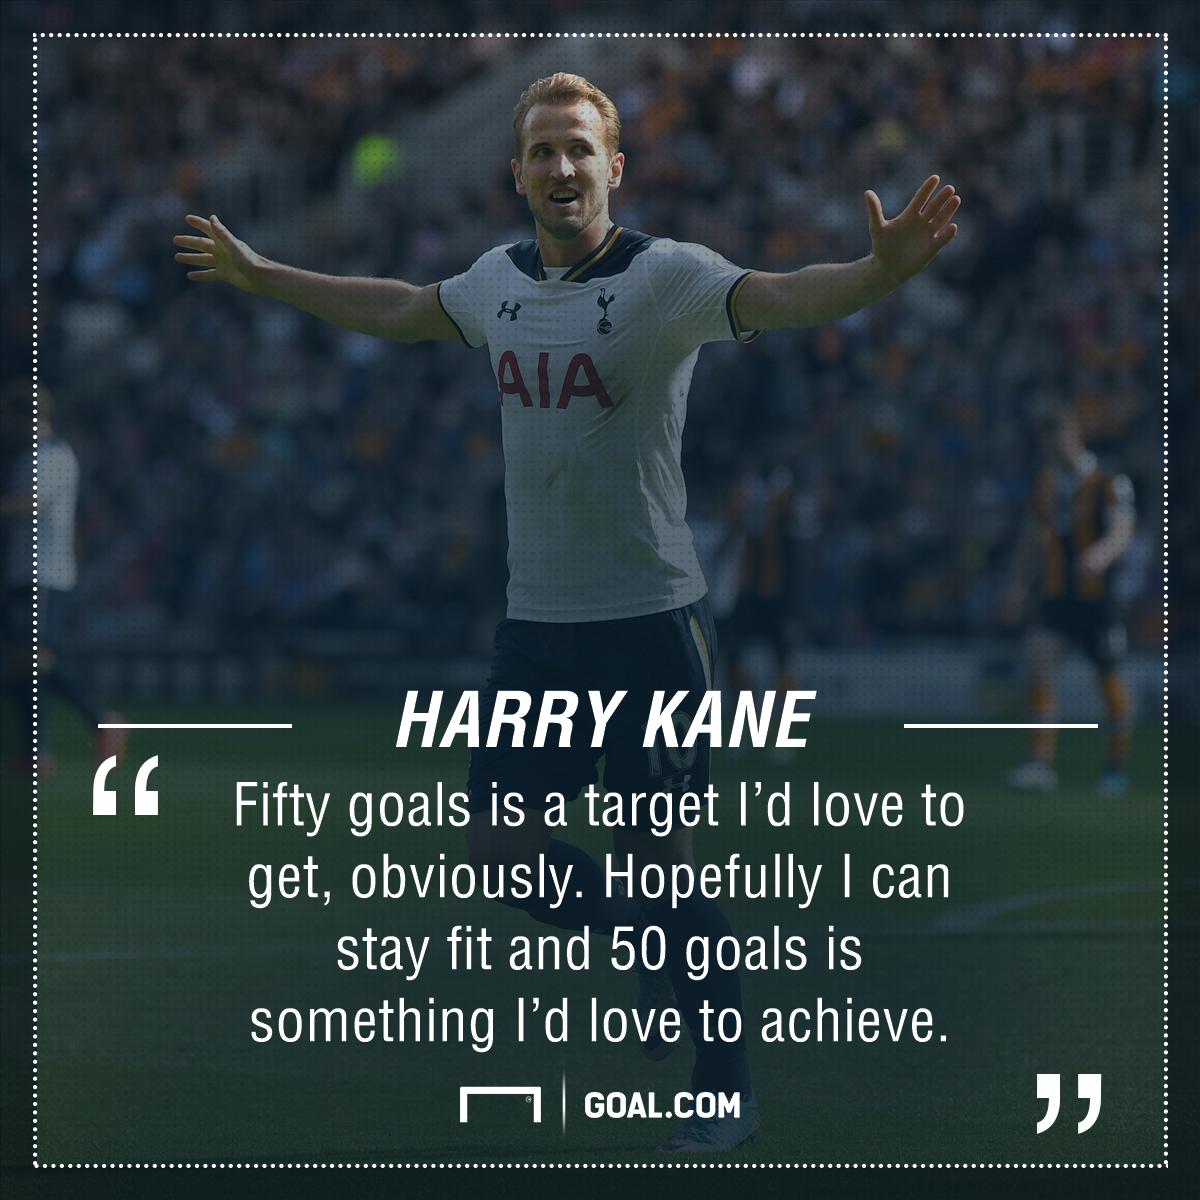 Harry Kane 50 goals